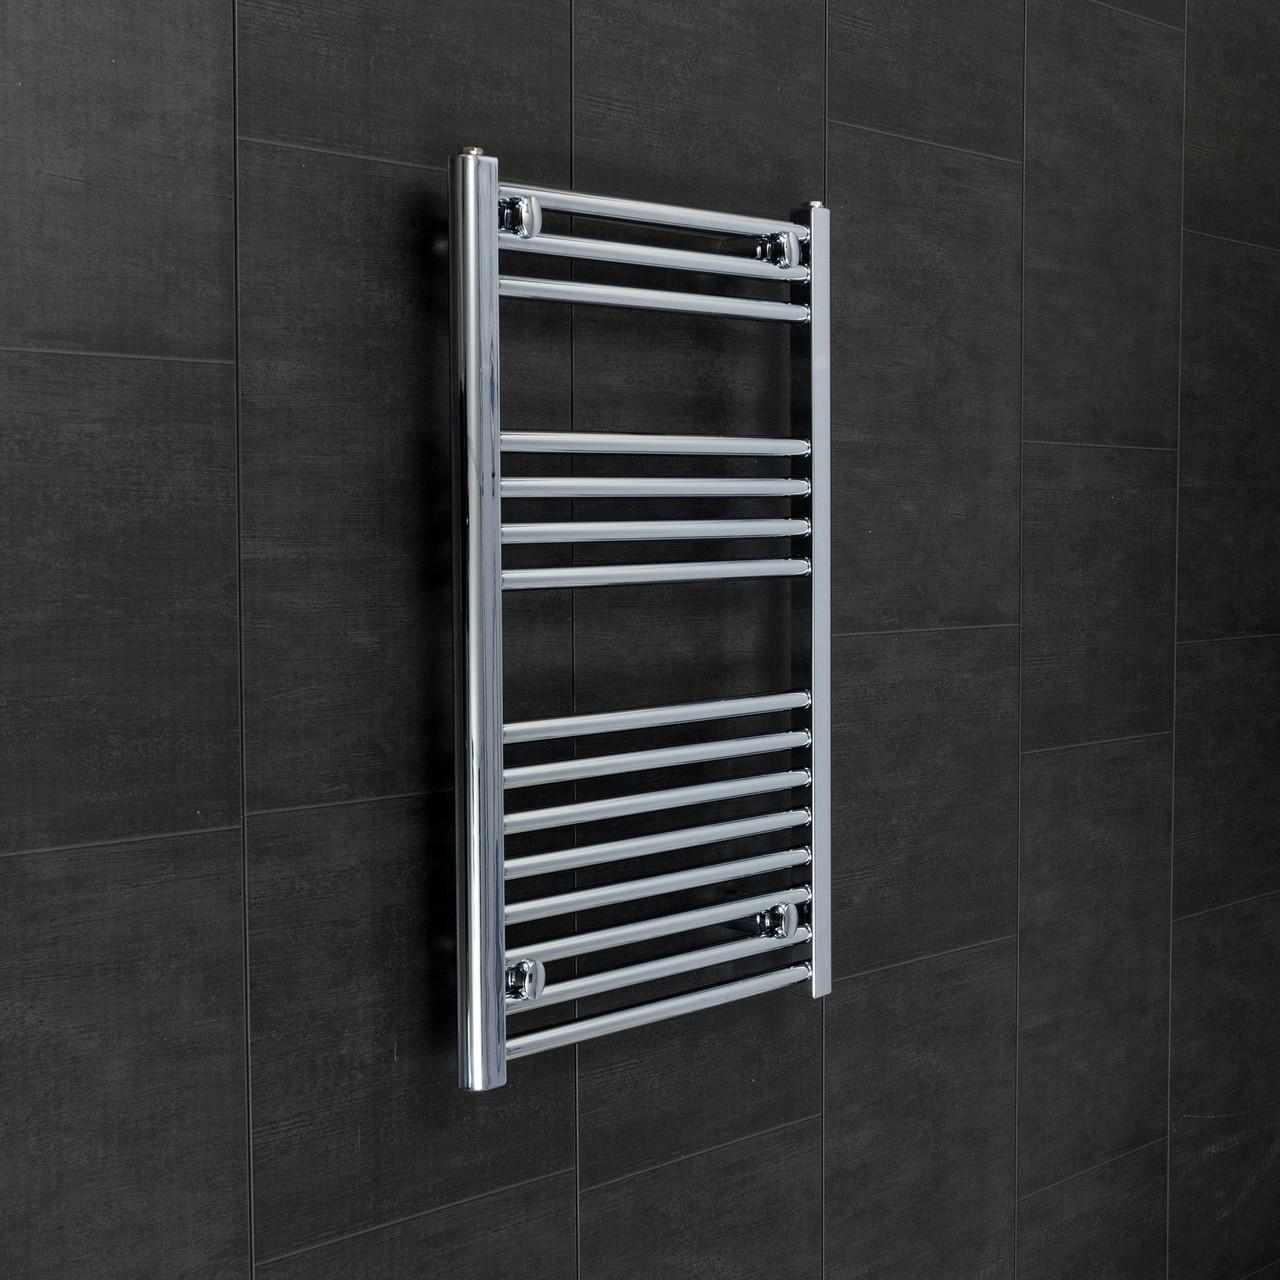 Kudox Flat Electric Towel Radiator: 500mm Wide 800mm High Heated Flat Chrome Towel Radiator